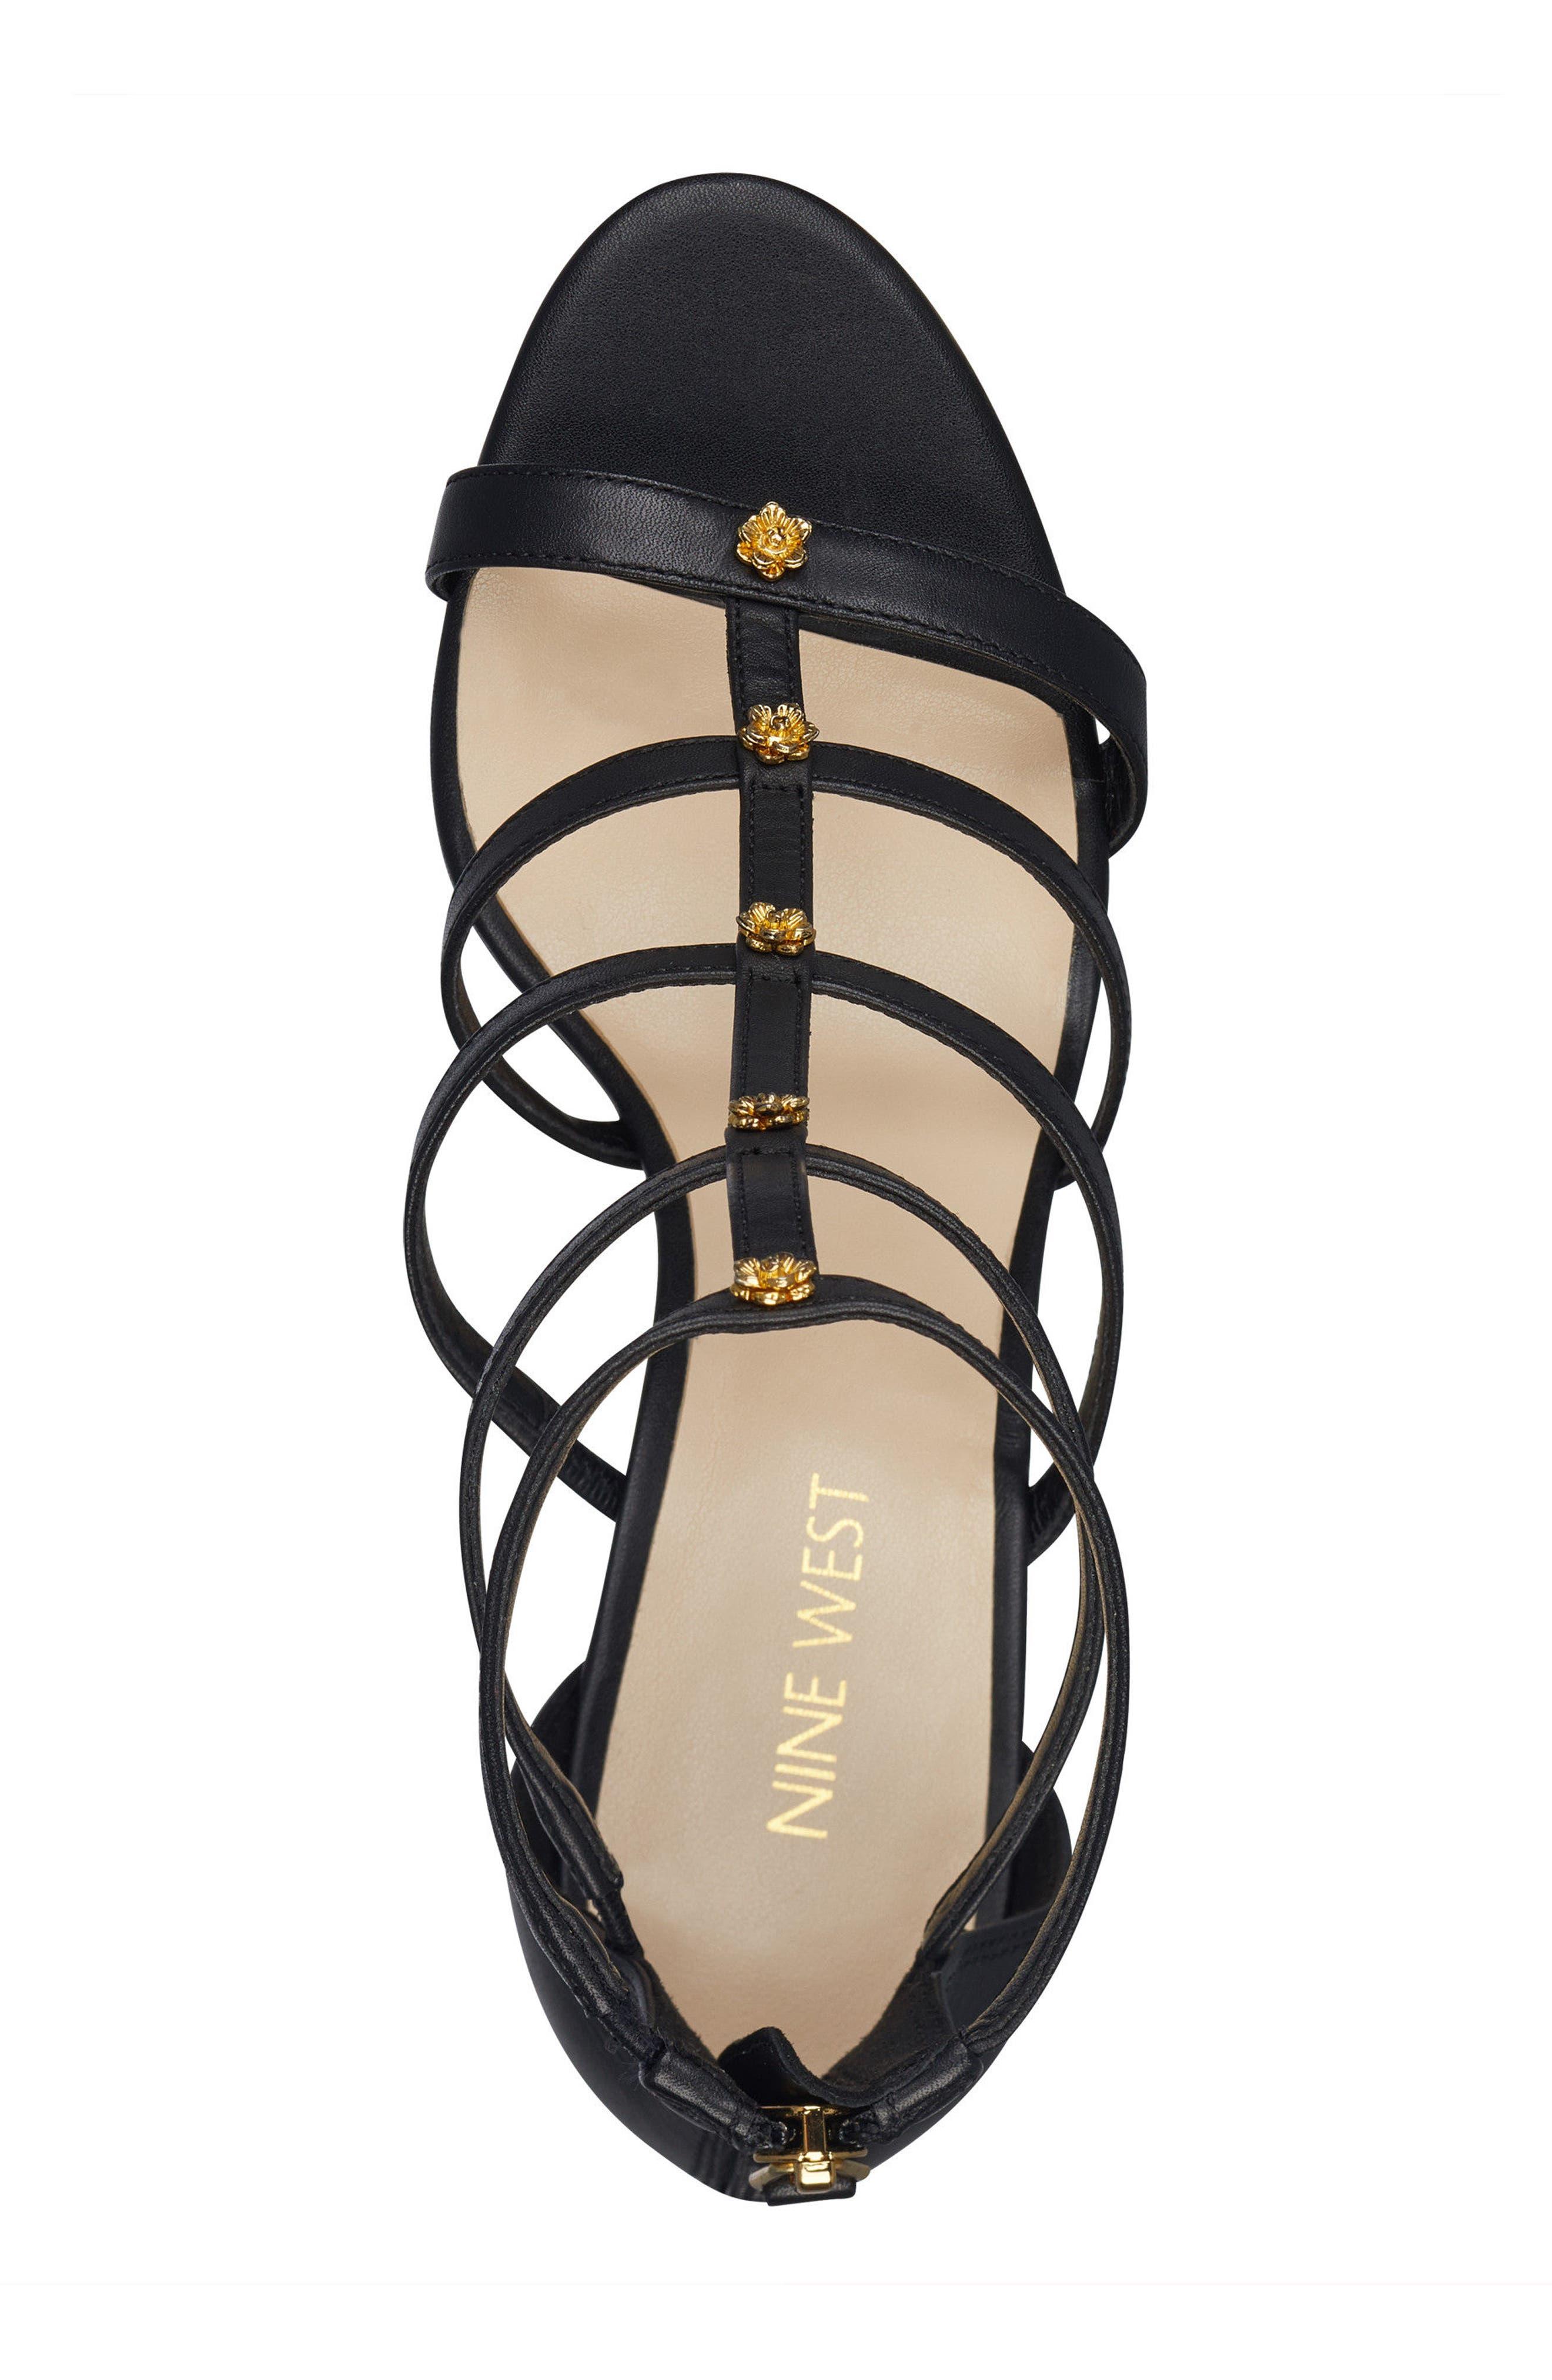 Nayler Strappy Sandal,                             Alternate thumbnail 5, color,                             Black Leather